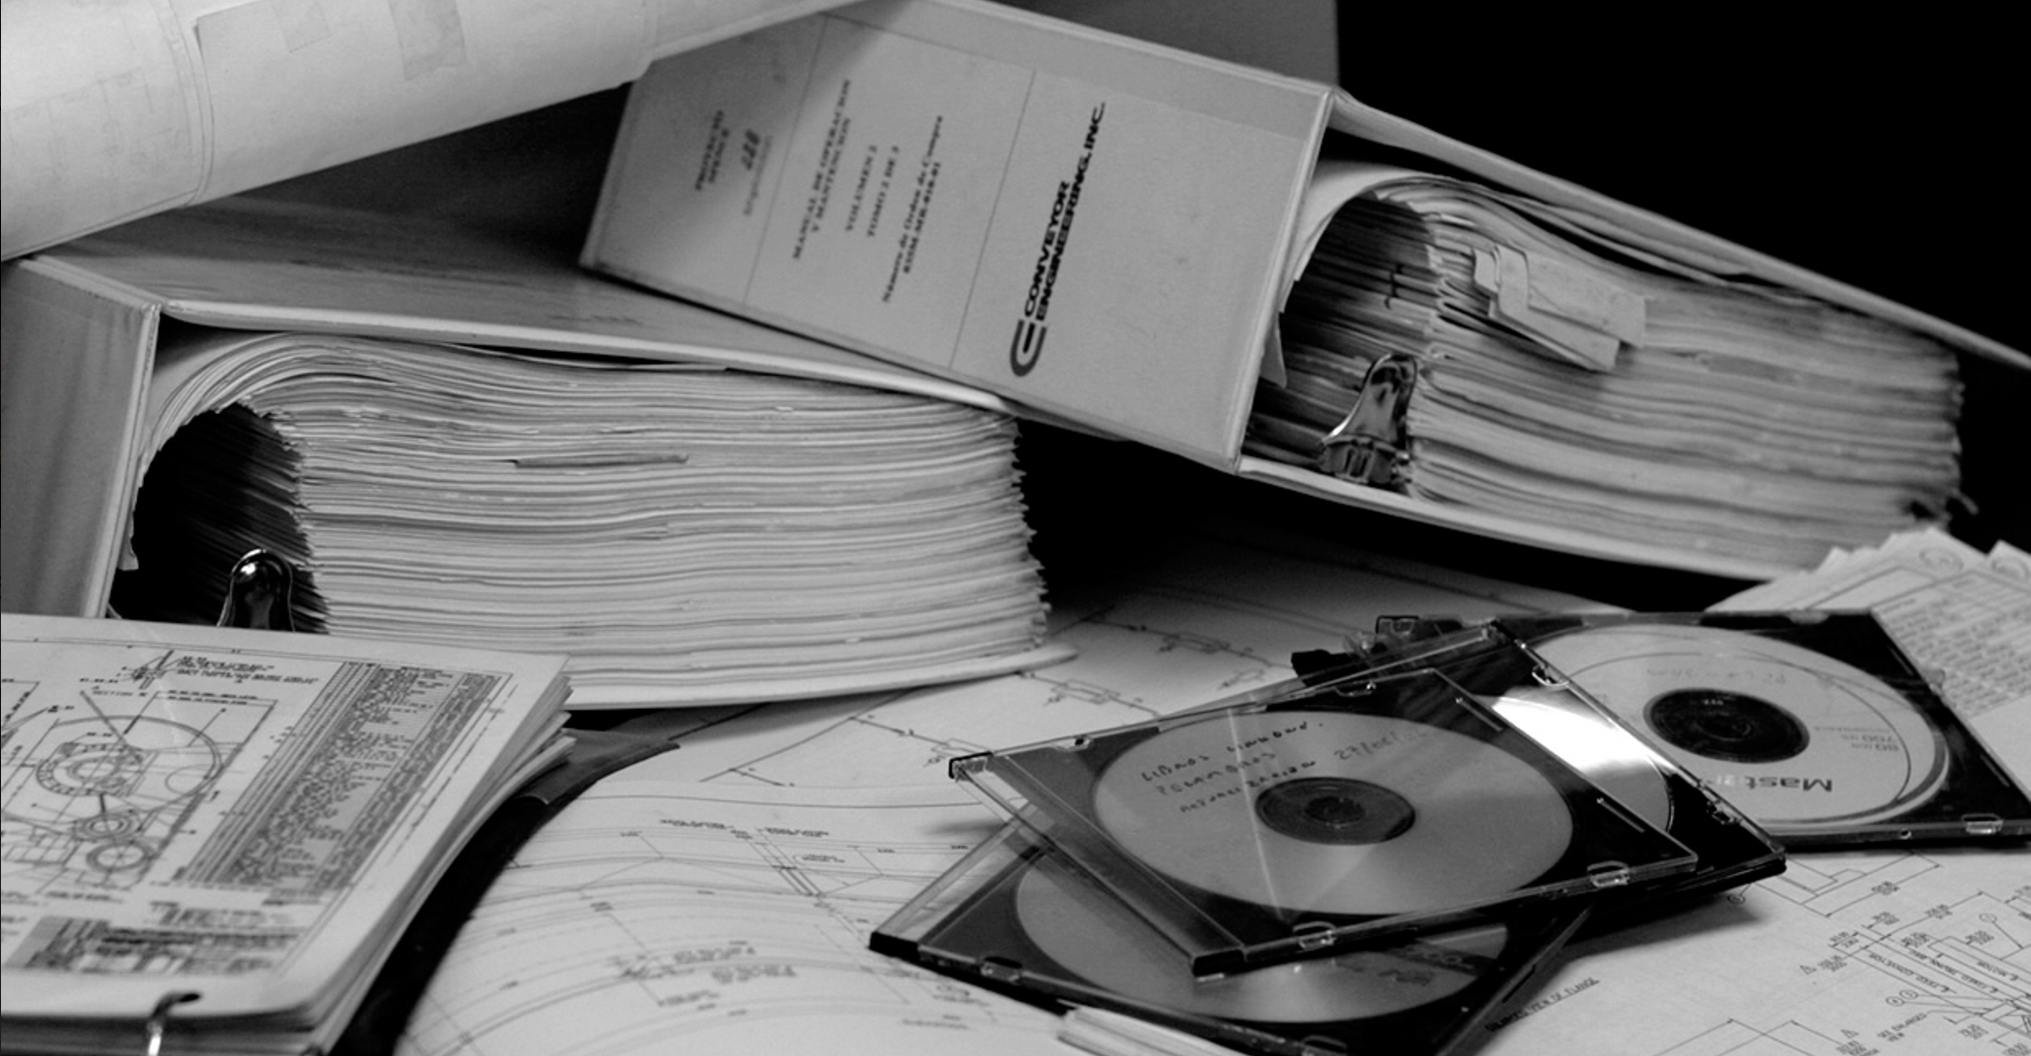 Paper parts catalog old PDF physical mound analog asset management maintenance